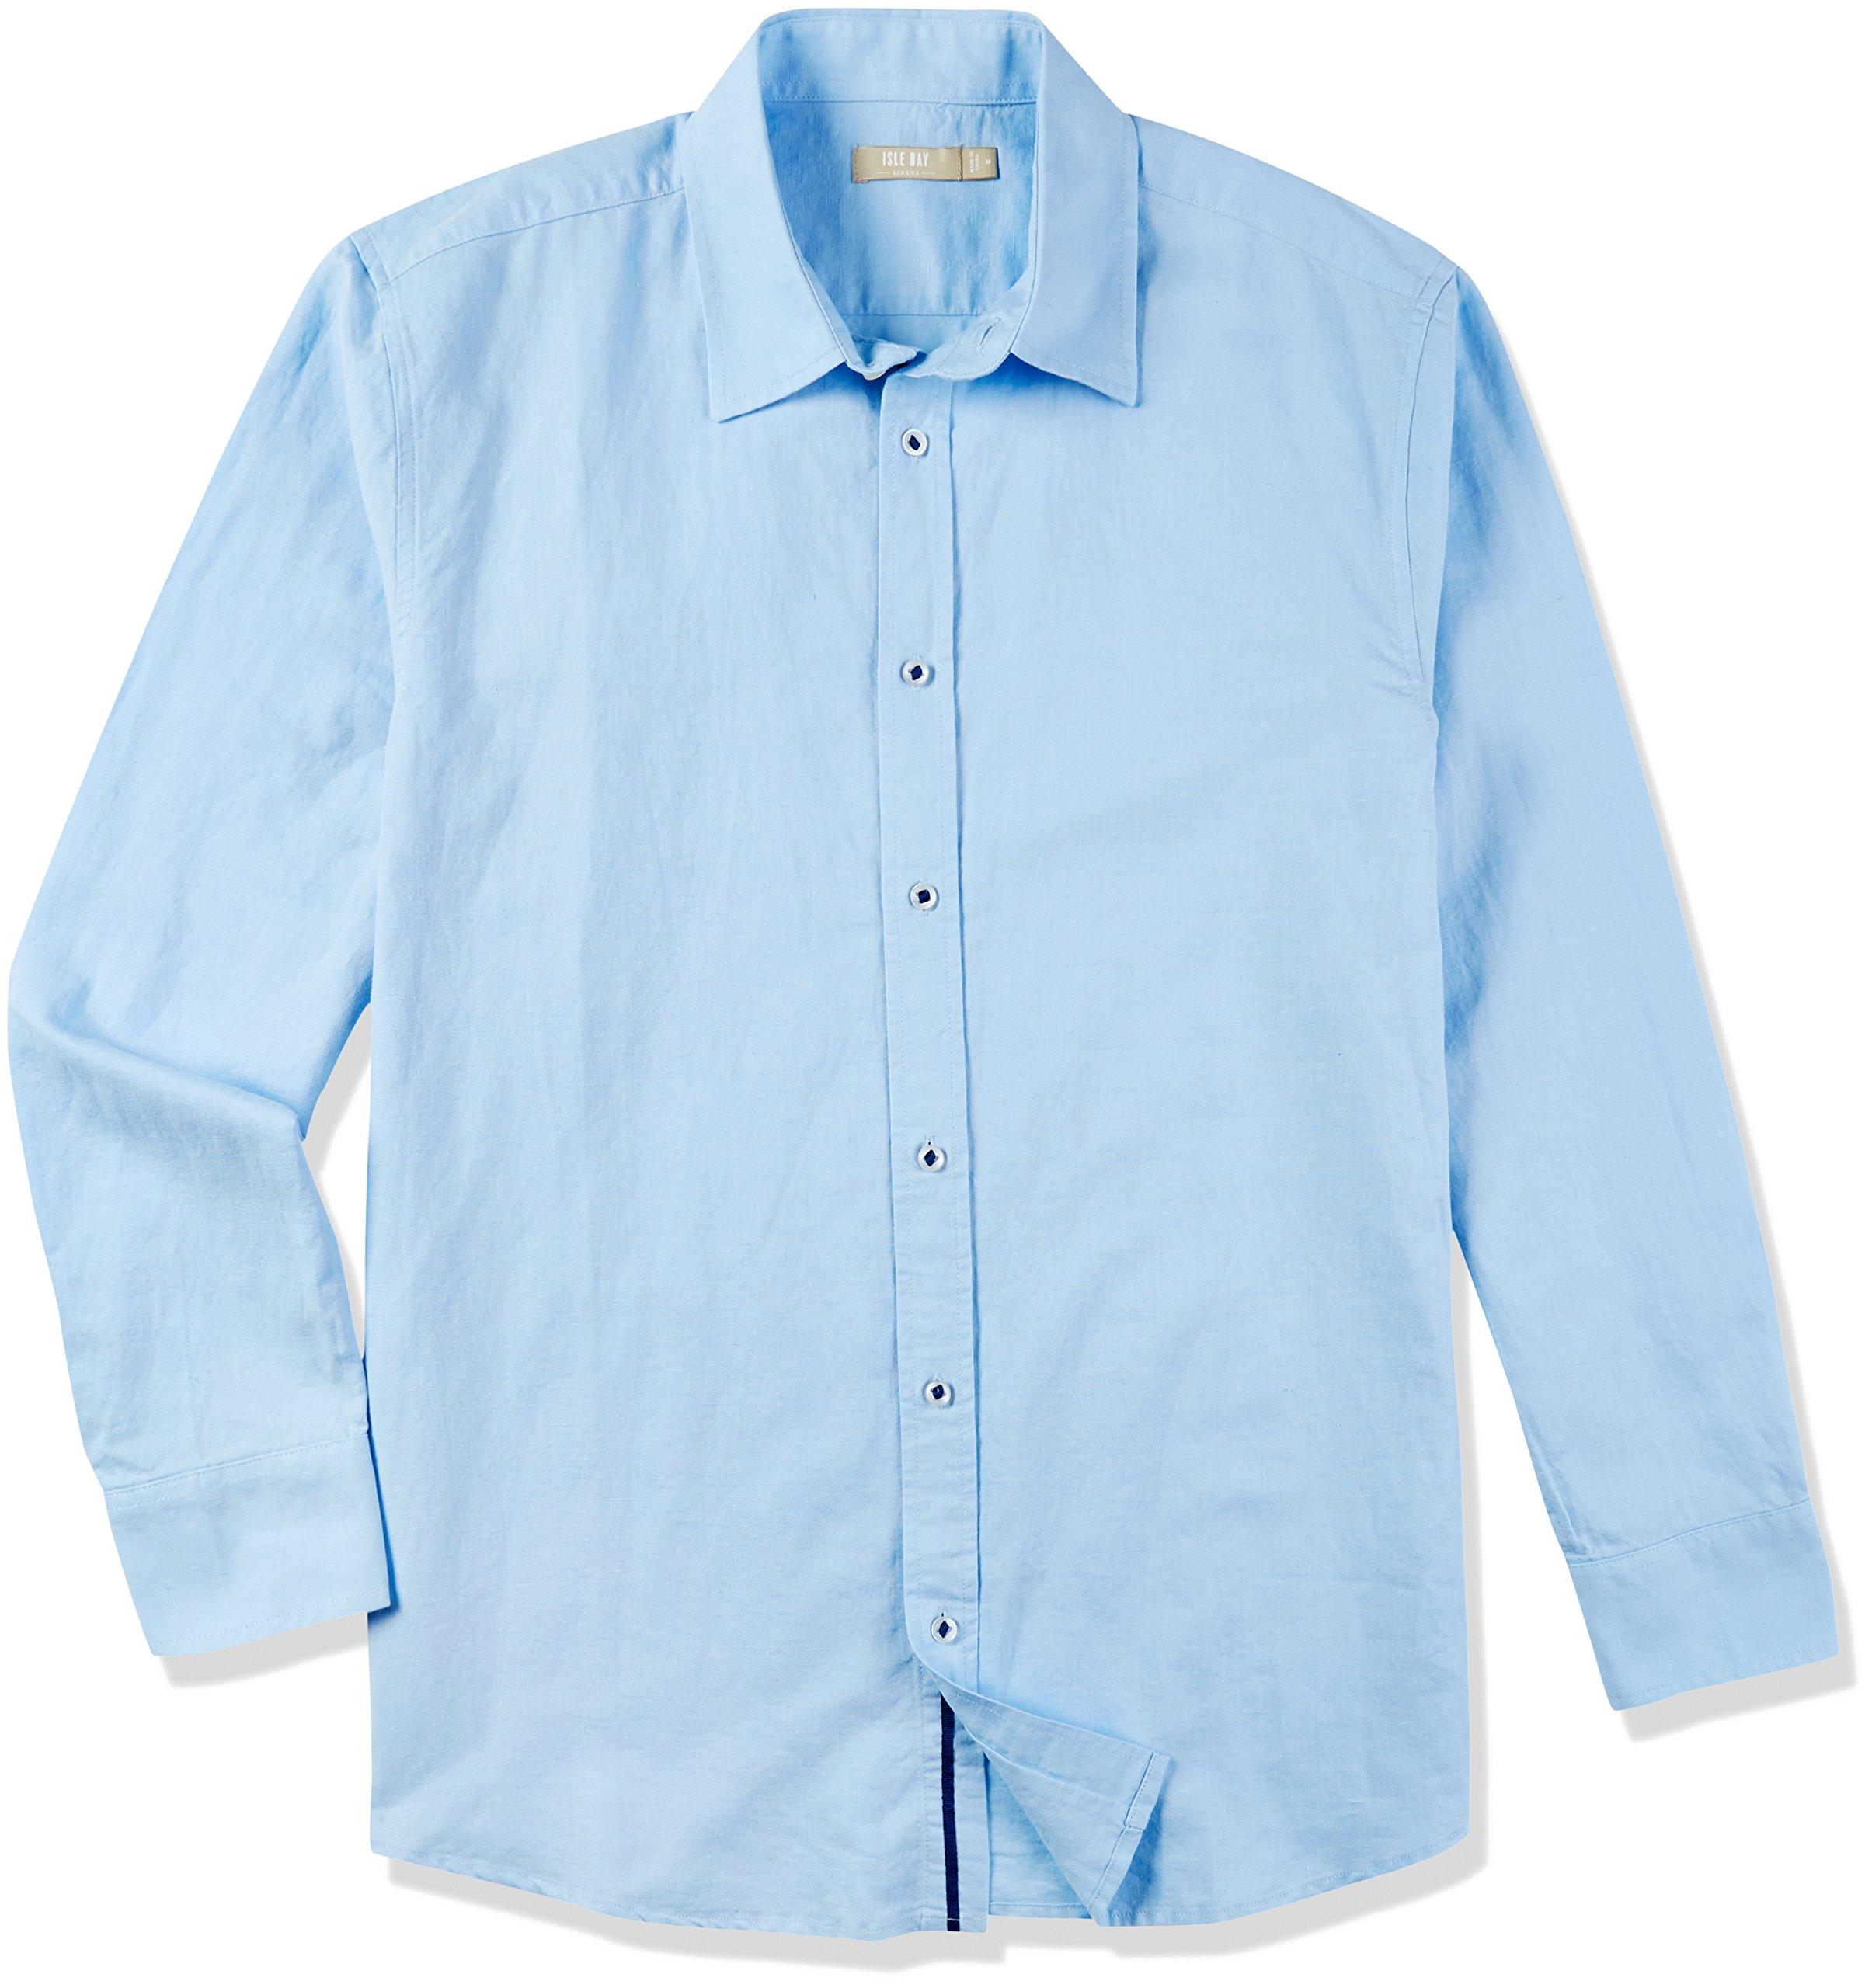 Isle Bay Linens Men's Standard-Fit Long Sleeve Casual Shirt Sky Blue Large